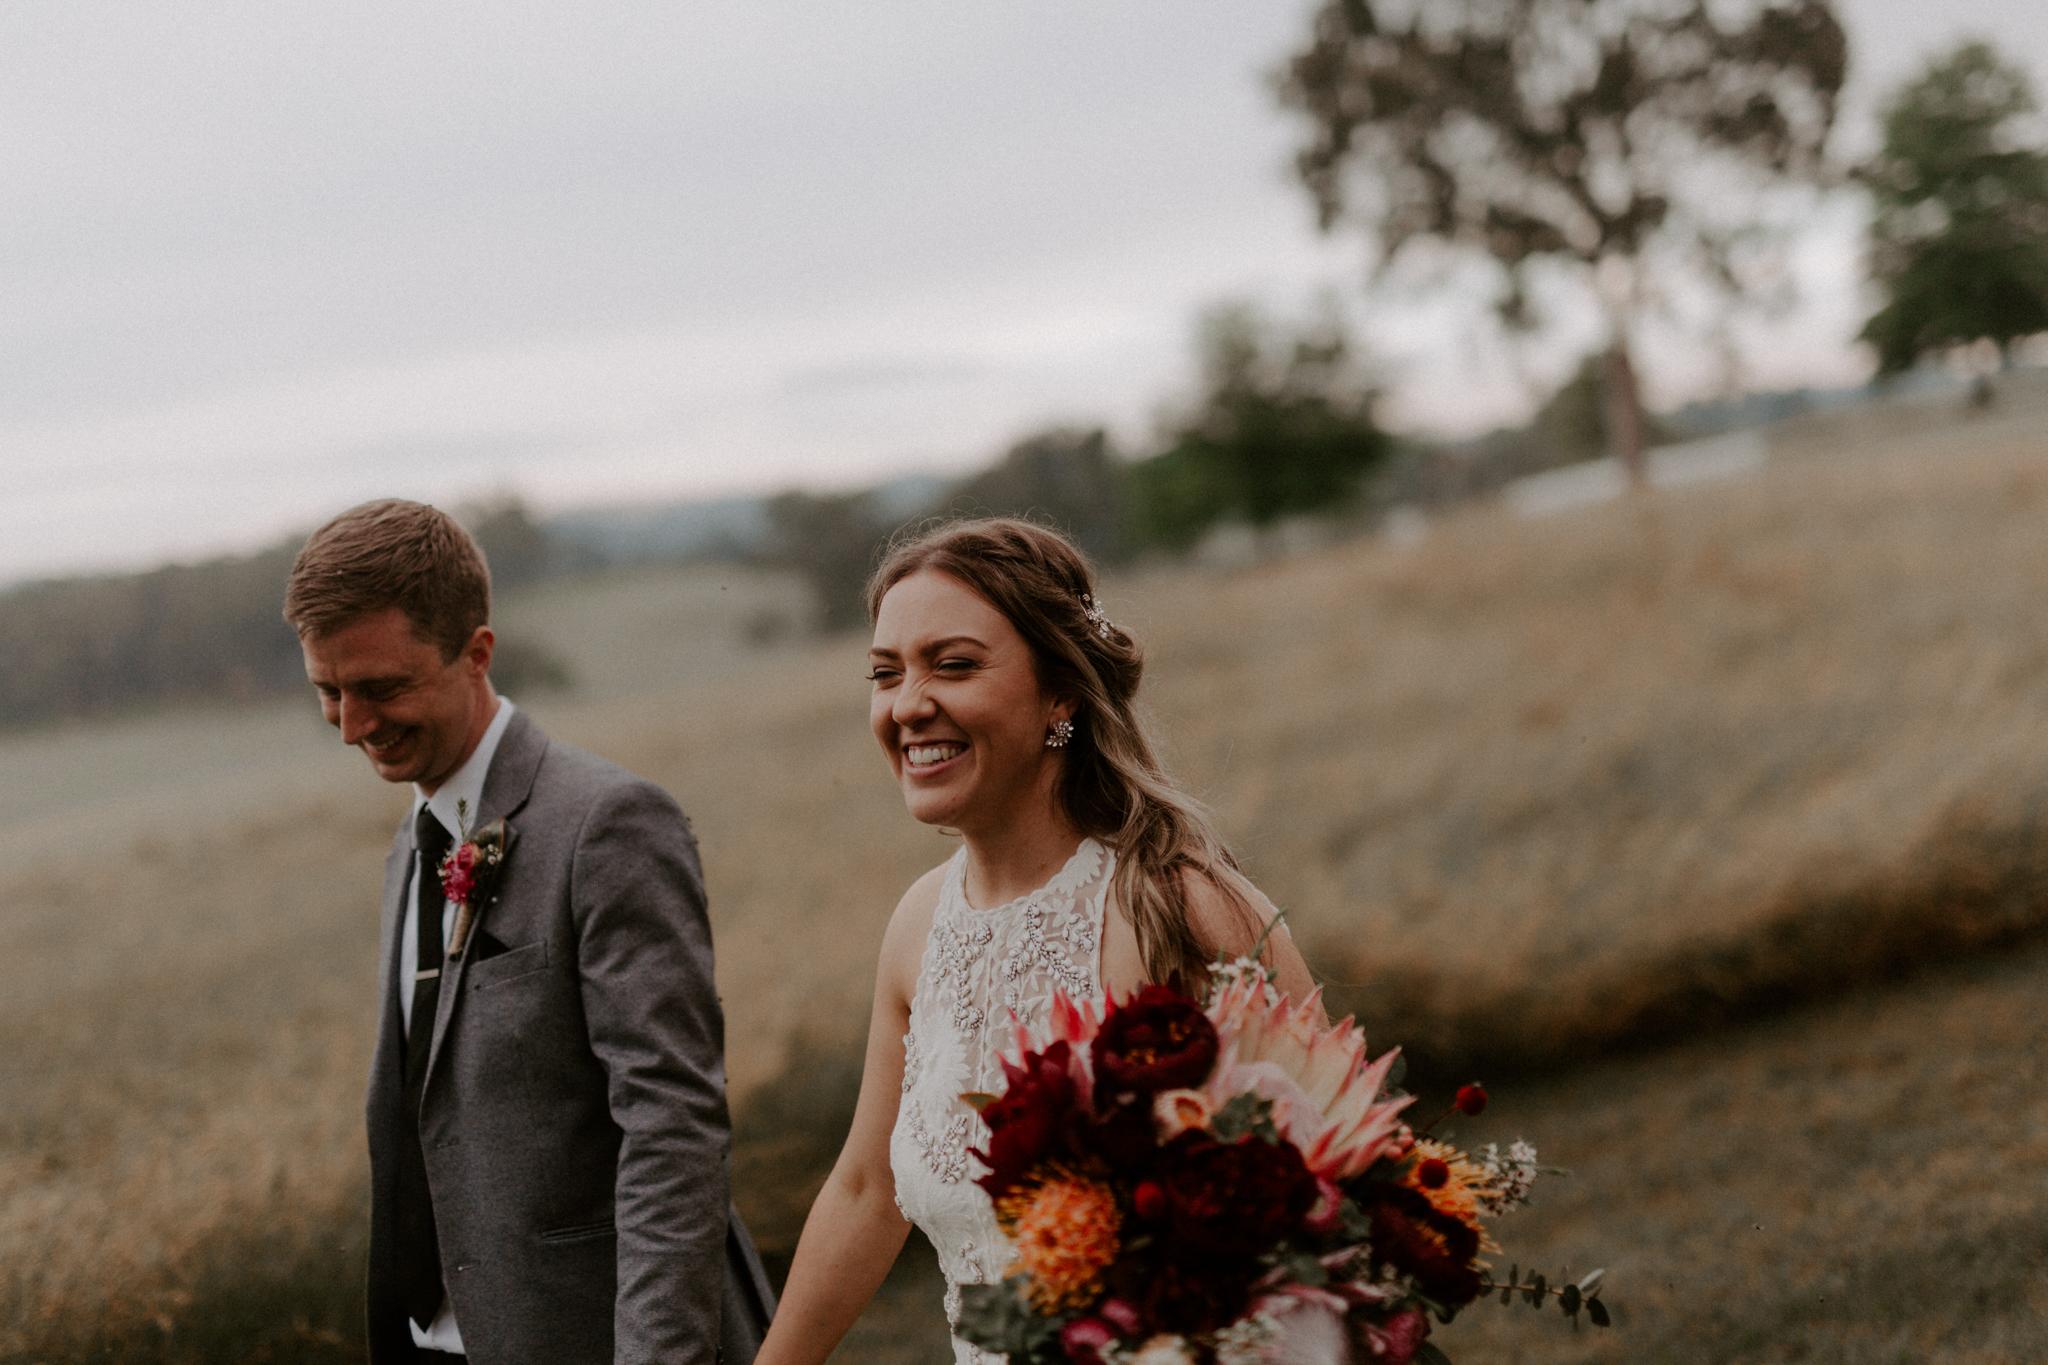 Wandin-Park-Estate-Wedding-Emotions-and-Math-Photography-159.jpg